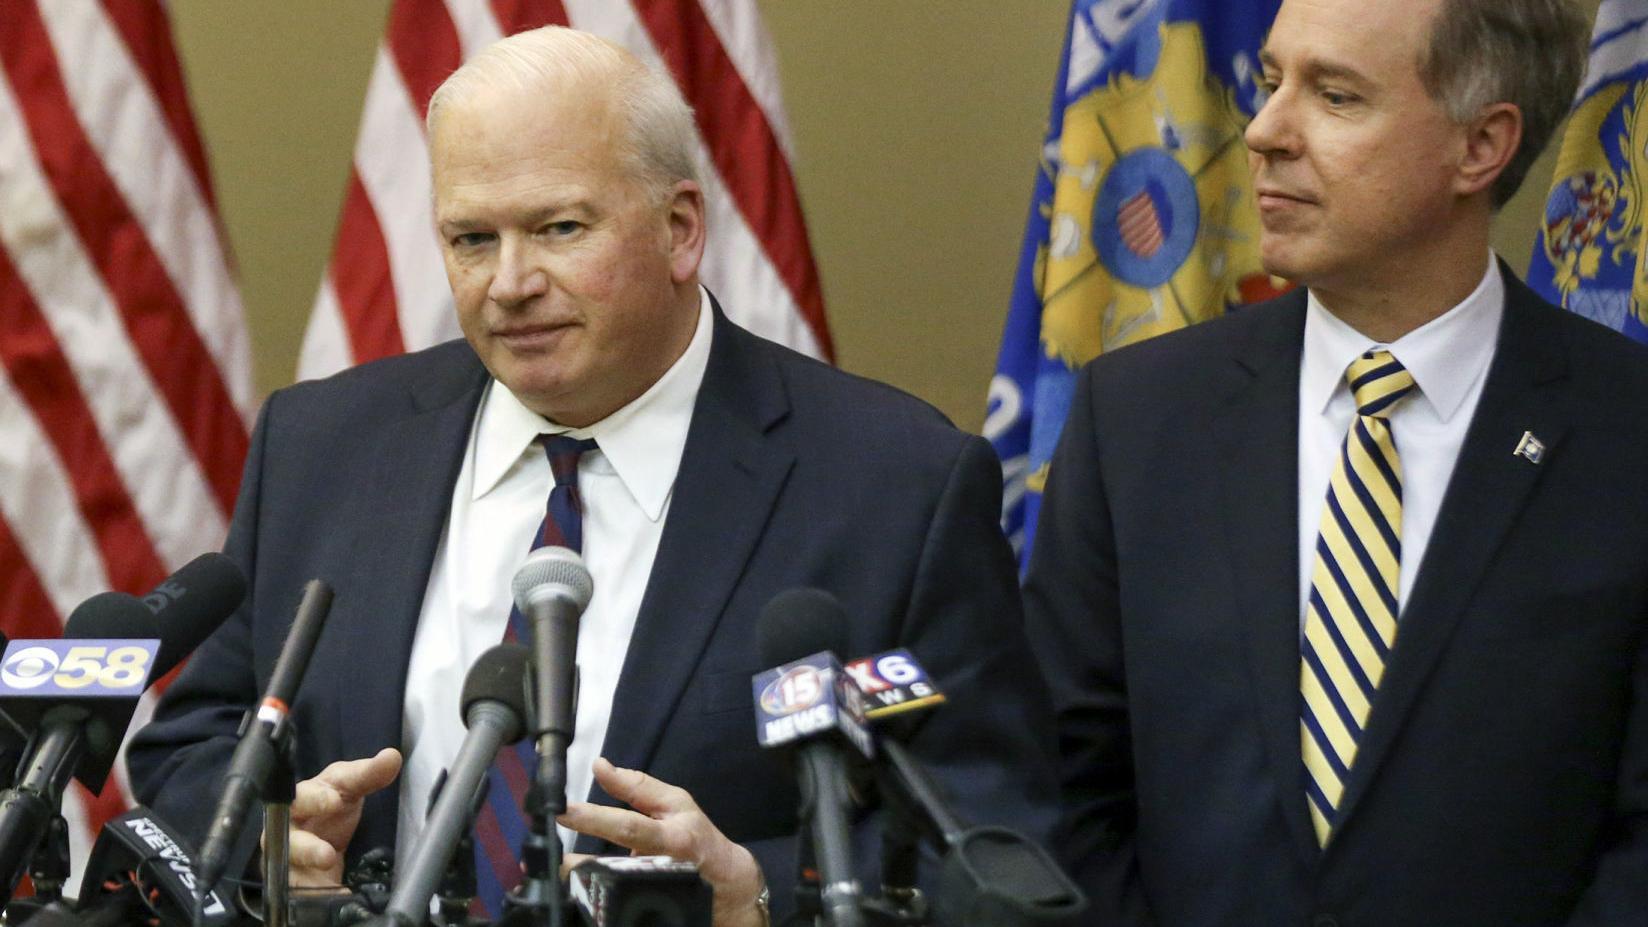 Legislature plans to meet next week on COVID-19 response legislation